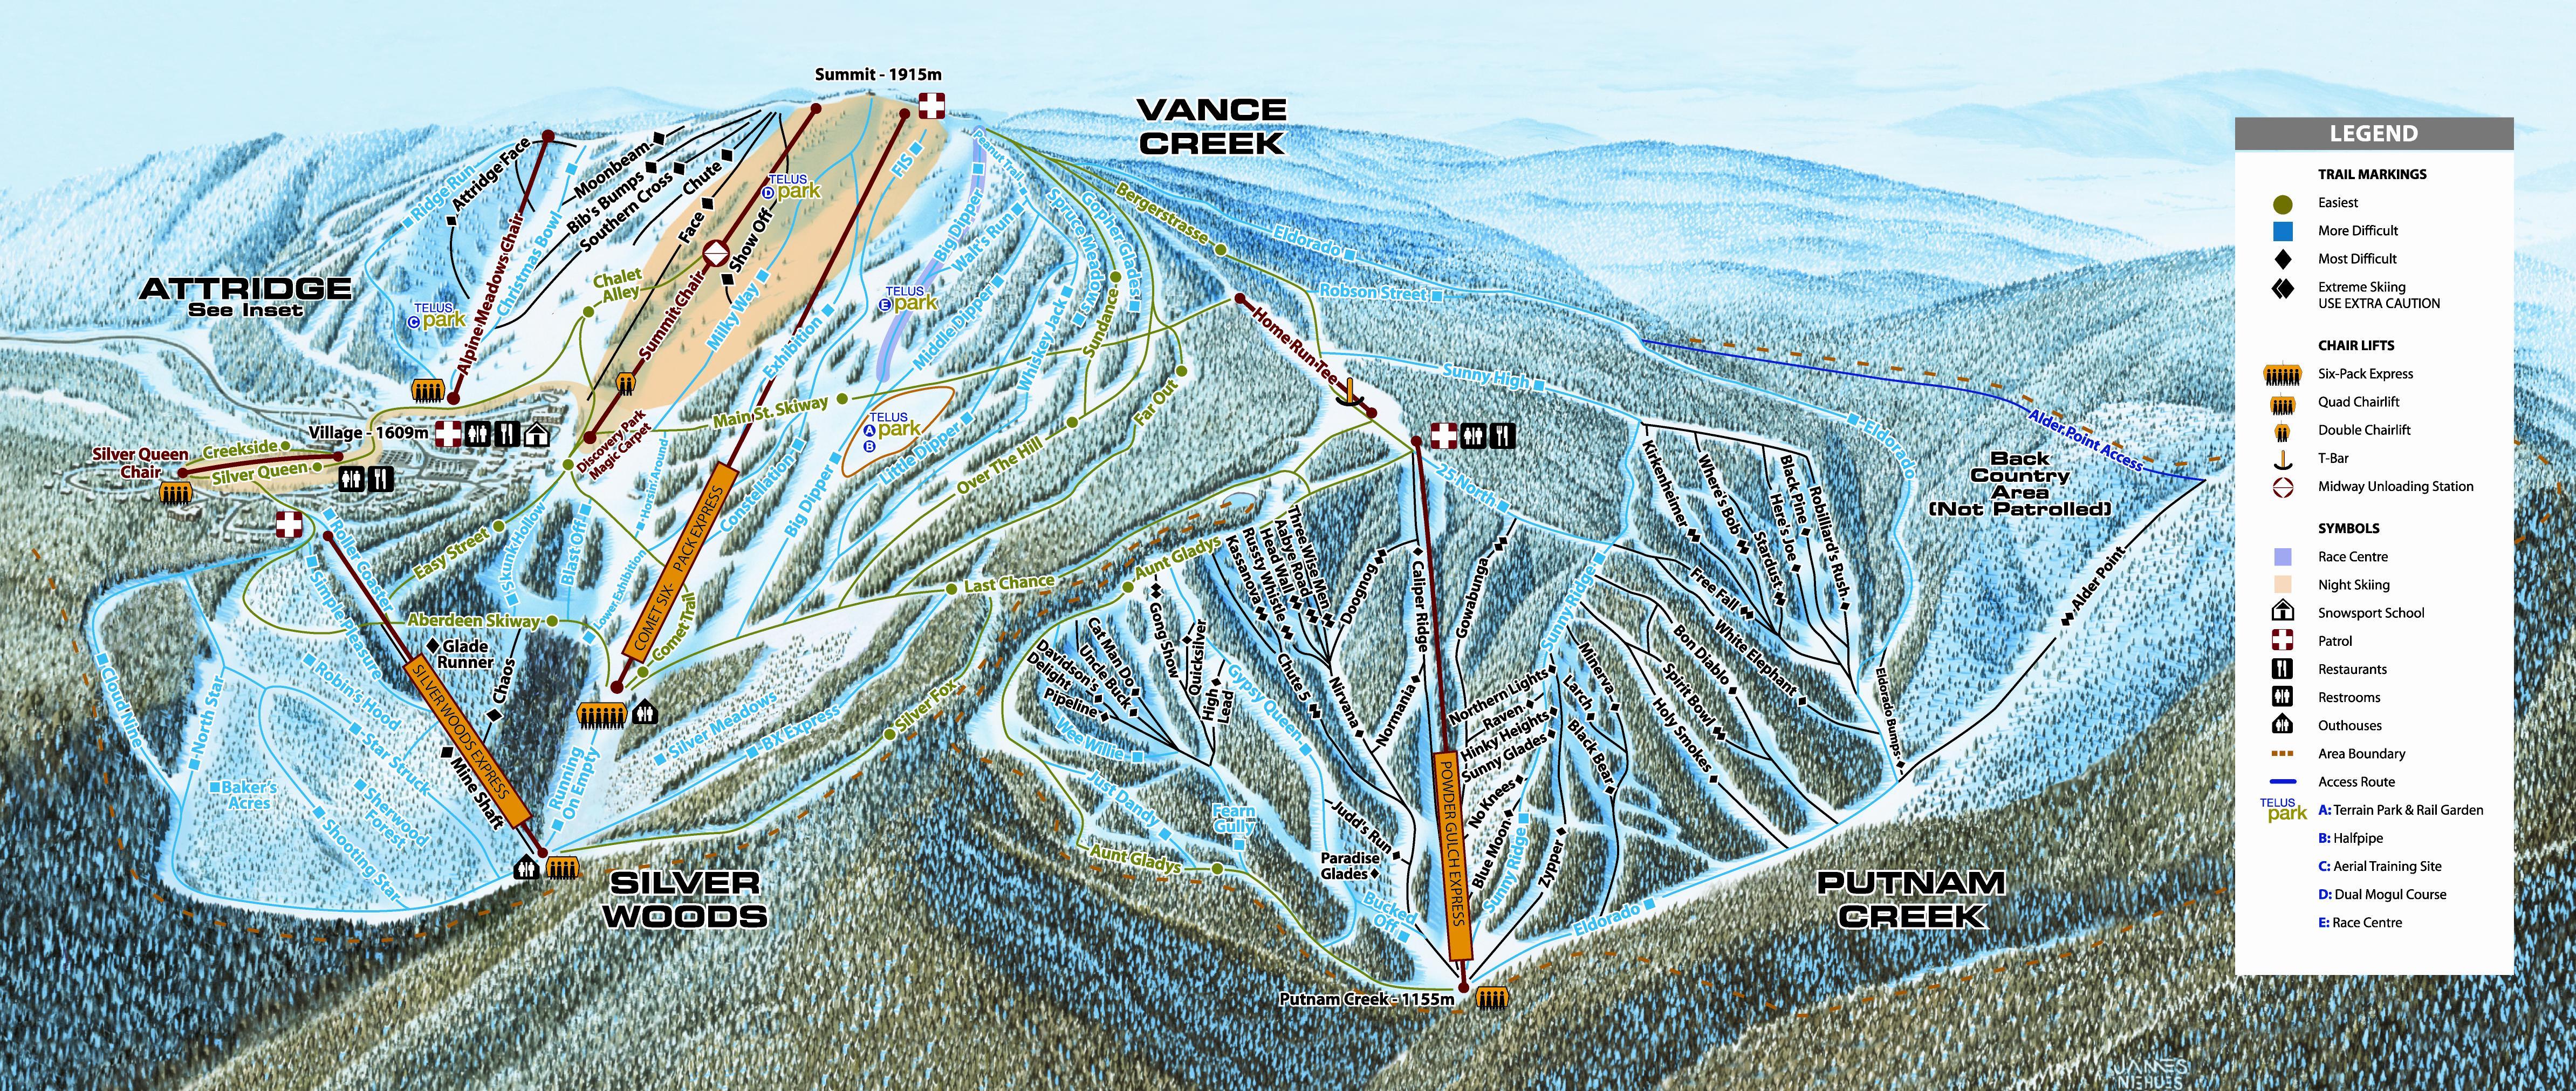 silver star mountain resort information | okchalets